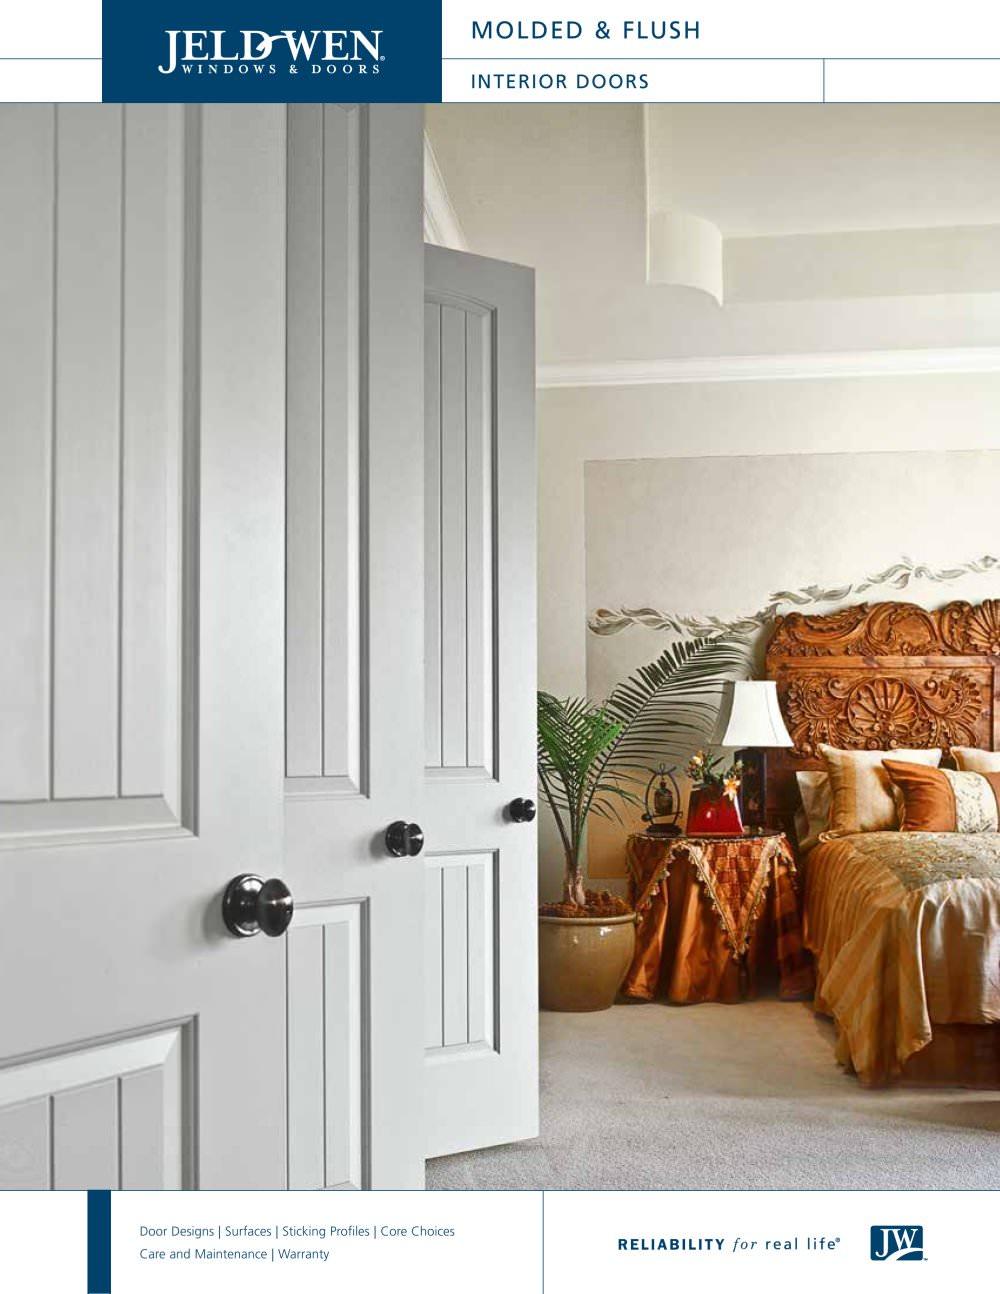 ... Interior Molded Doors Heritage Millwork Inc Wholesale Millwork  Distributor Interior Doors Interior Doors Ramsey MN MDF Passage Doors  Interior Molded ...